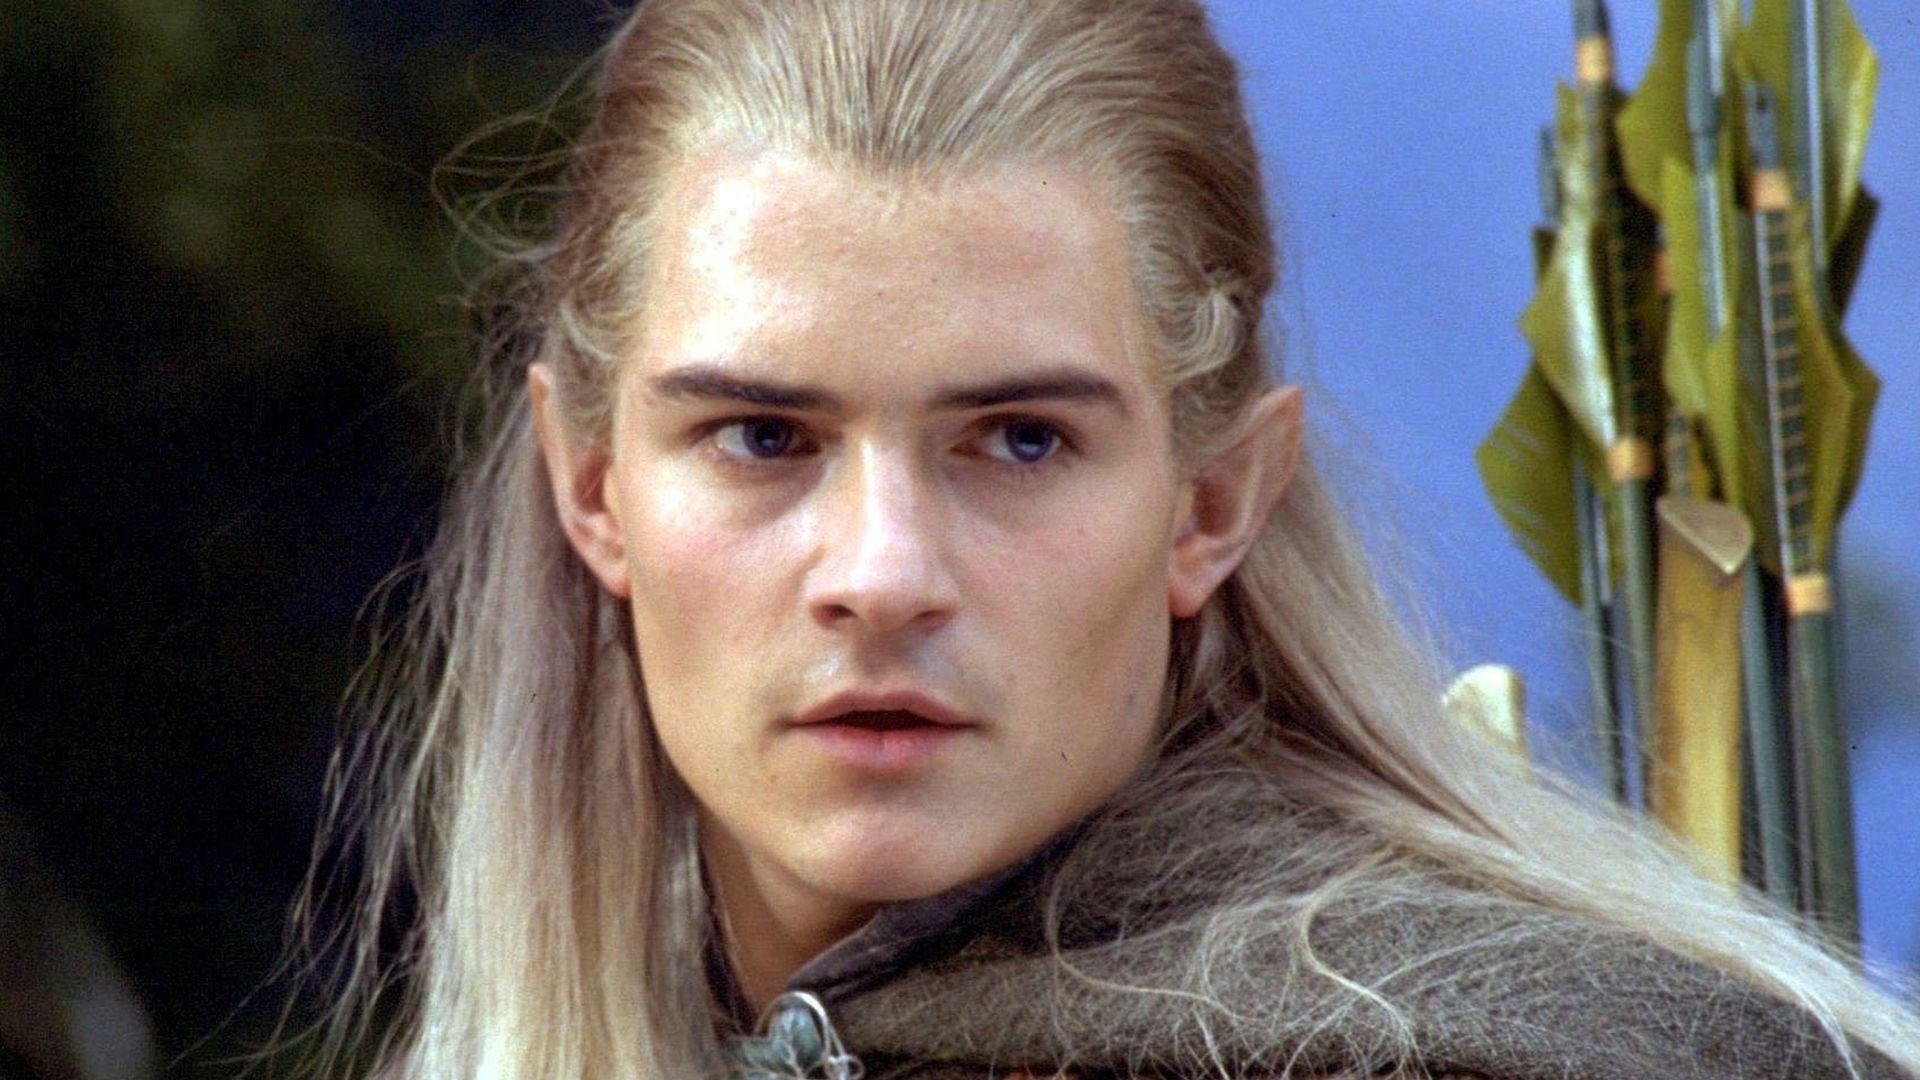 Eher Legolas Als Daenerys Got Fans Verspotten Wachsfigur